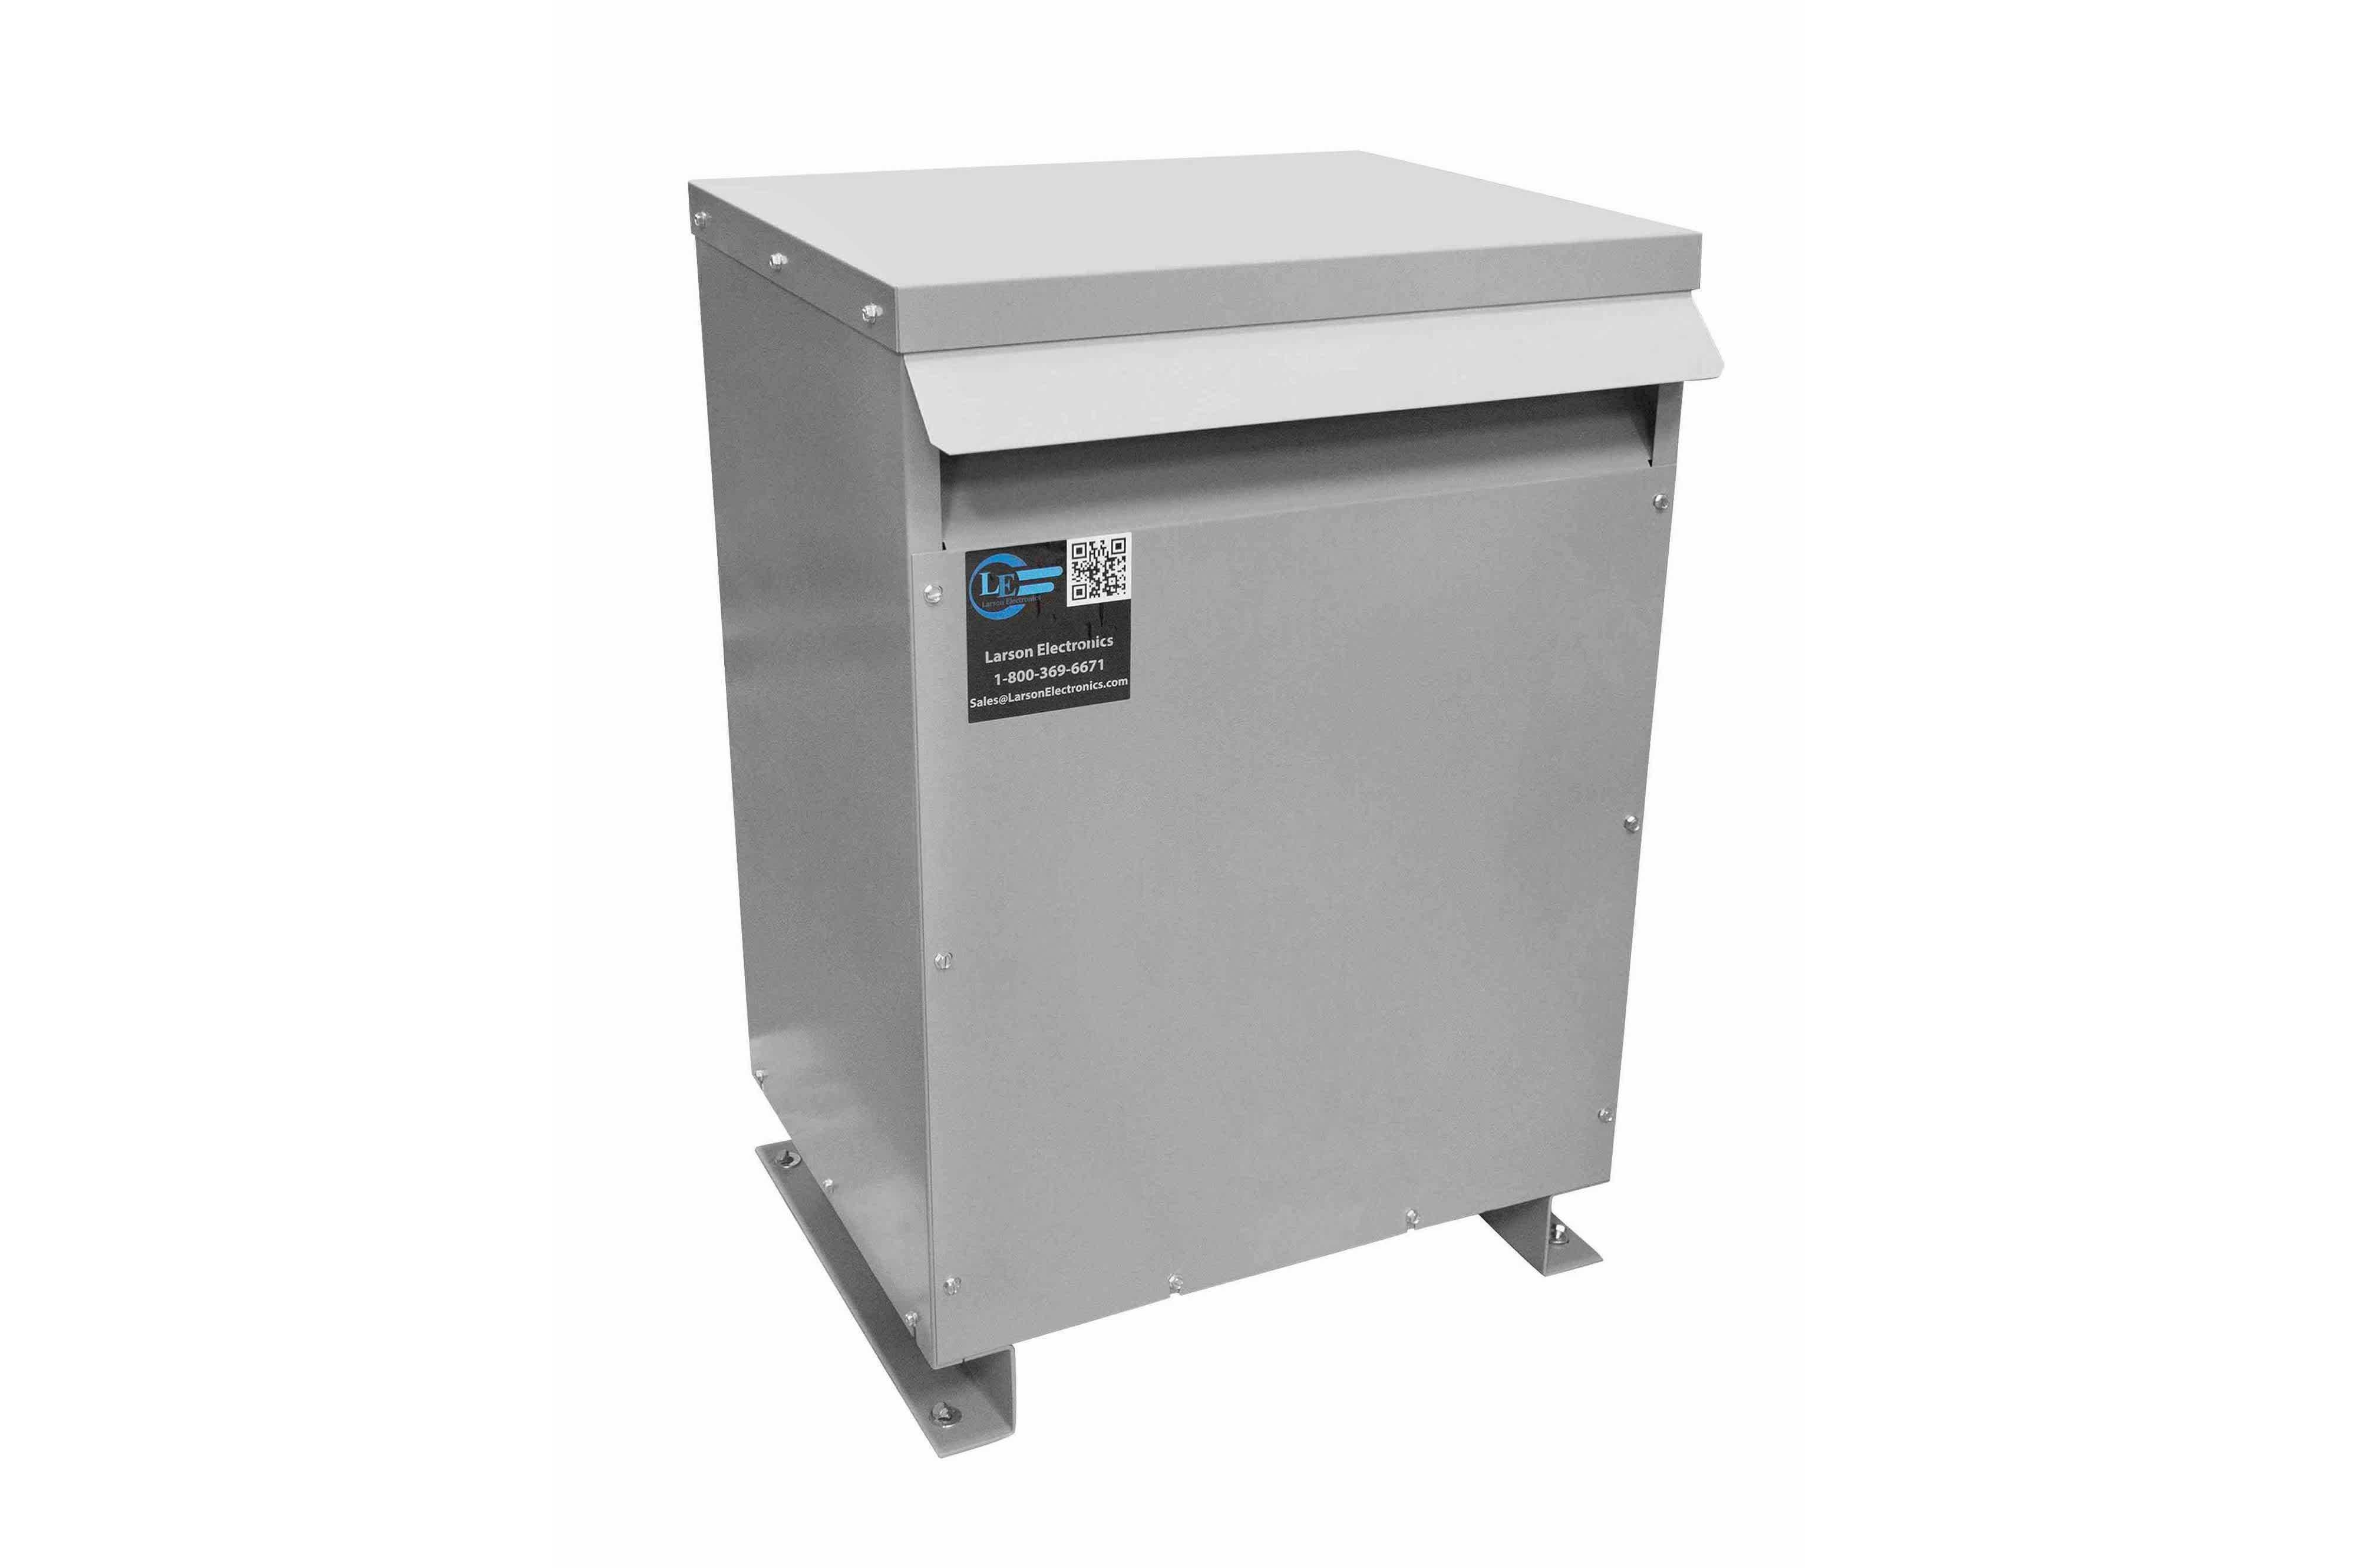 150 kVA 3PH Isolation Transformer, 460V Wye Primary, 575V Delta Secondary, N3R, Ventilated, 60 Hz